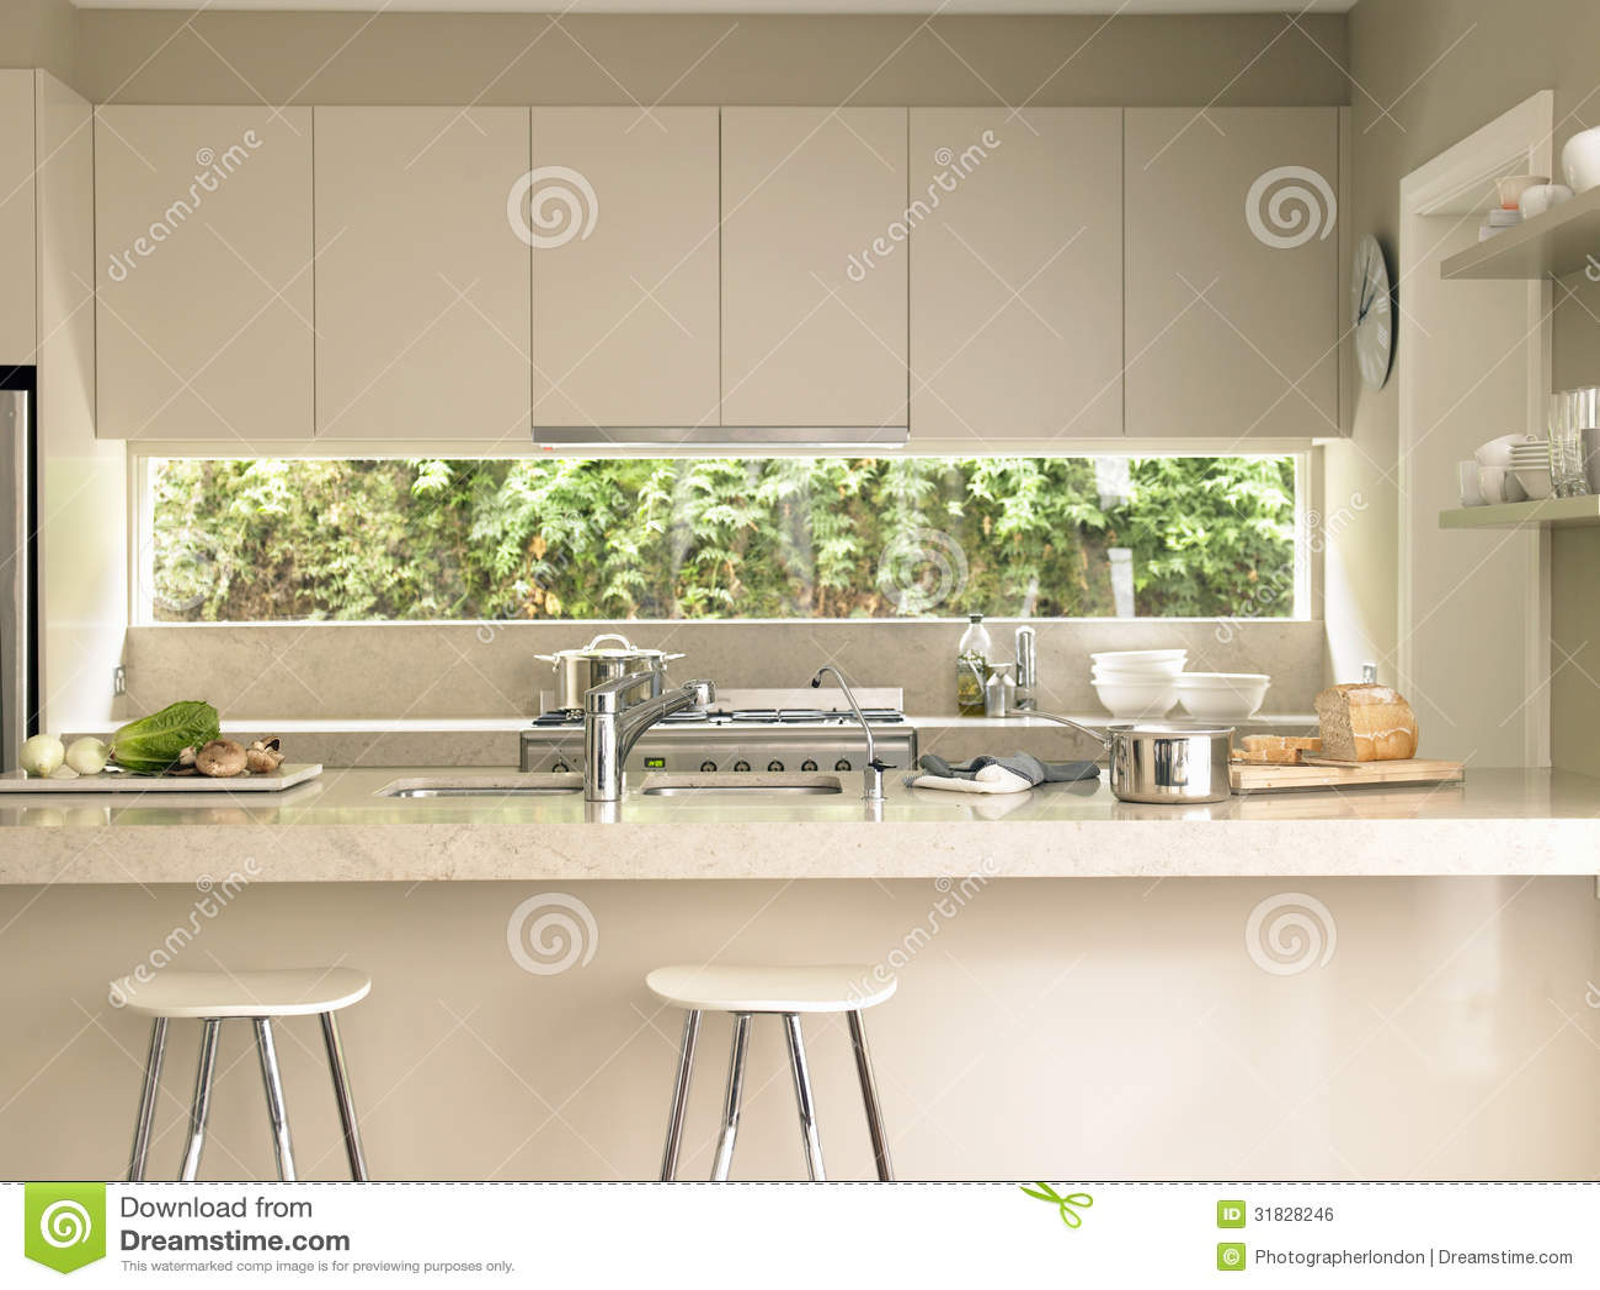 Moderne Hi Macs Kuche Insel – Ailedange.info | {Moderne küchen mit insel 70}